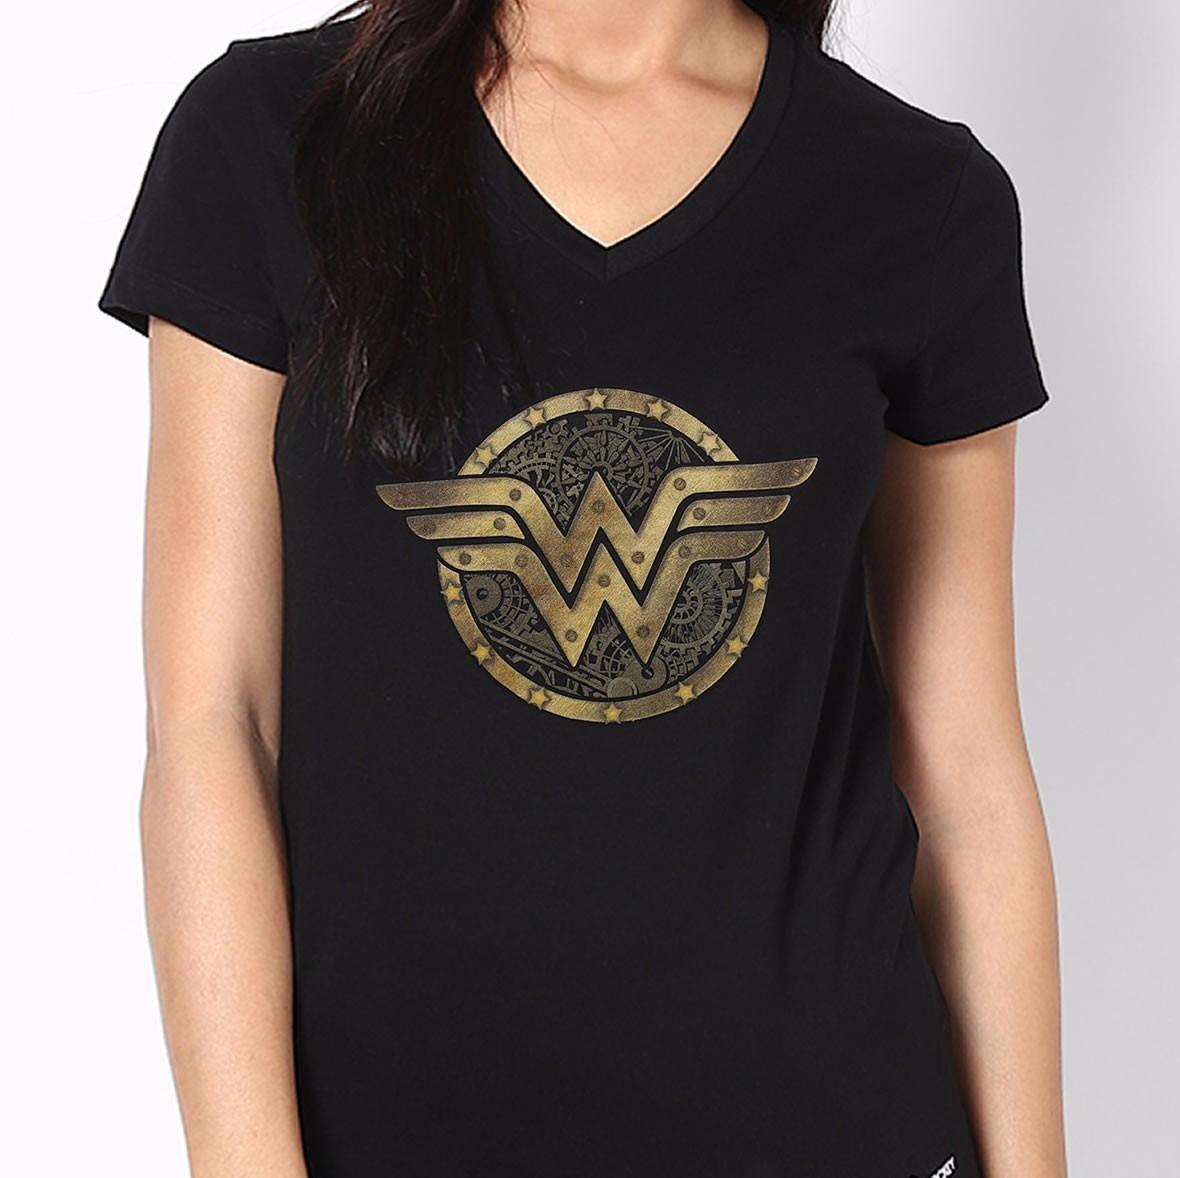 camiseta mulher maravilha batman vs supeman heroina camisa. Carregando zoom. 55b4d9fd1c5a2